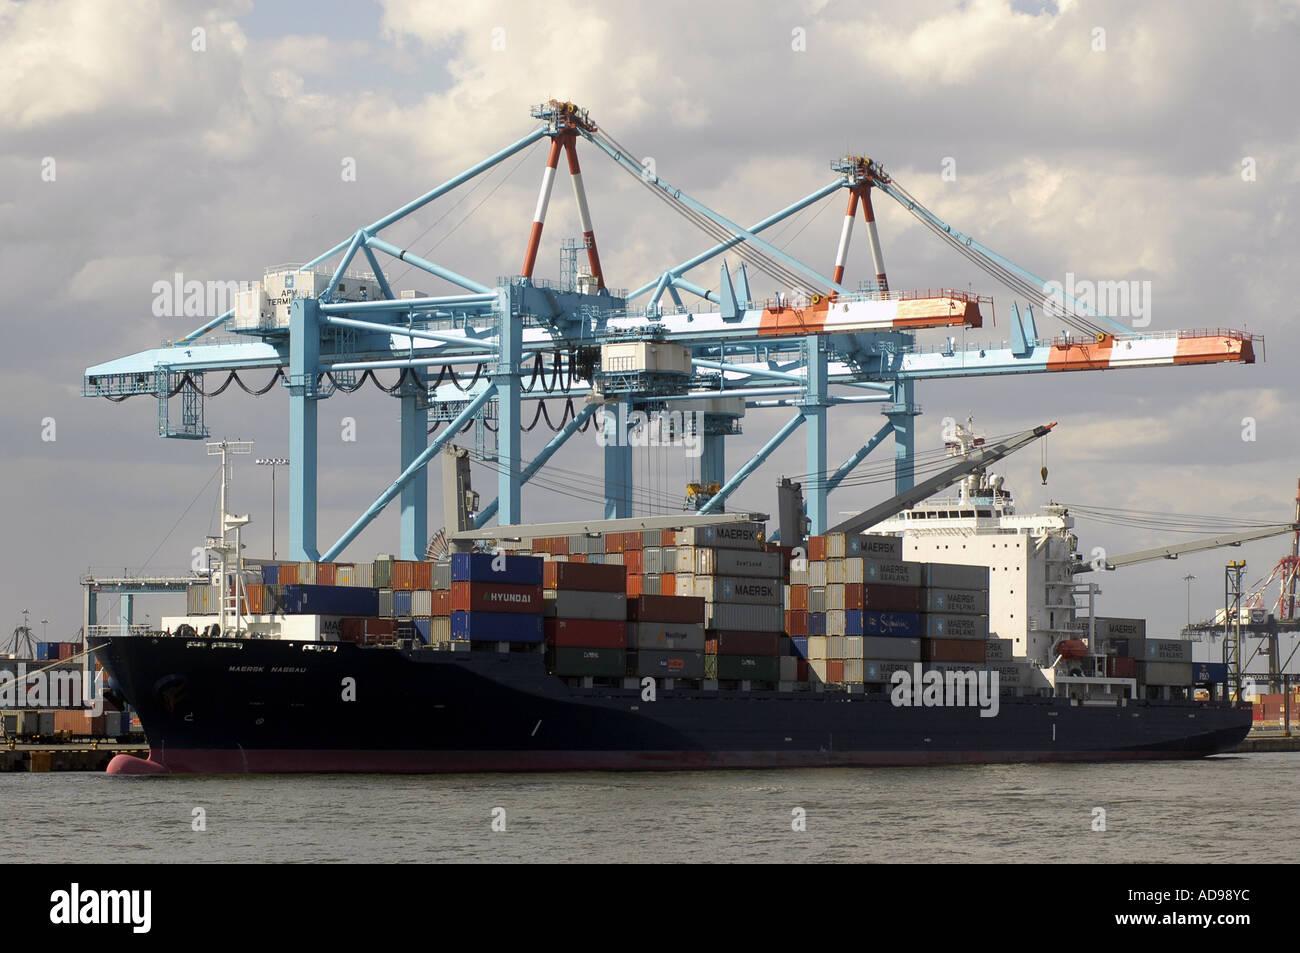 Ships loading in Port Elizabeth New Jersey - Stock Image